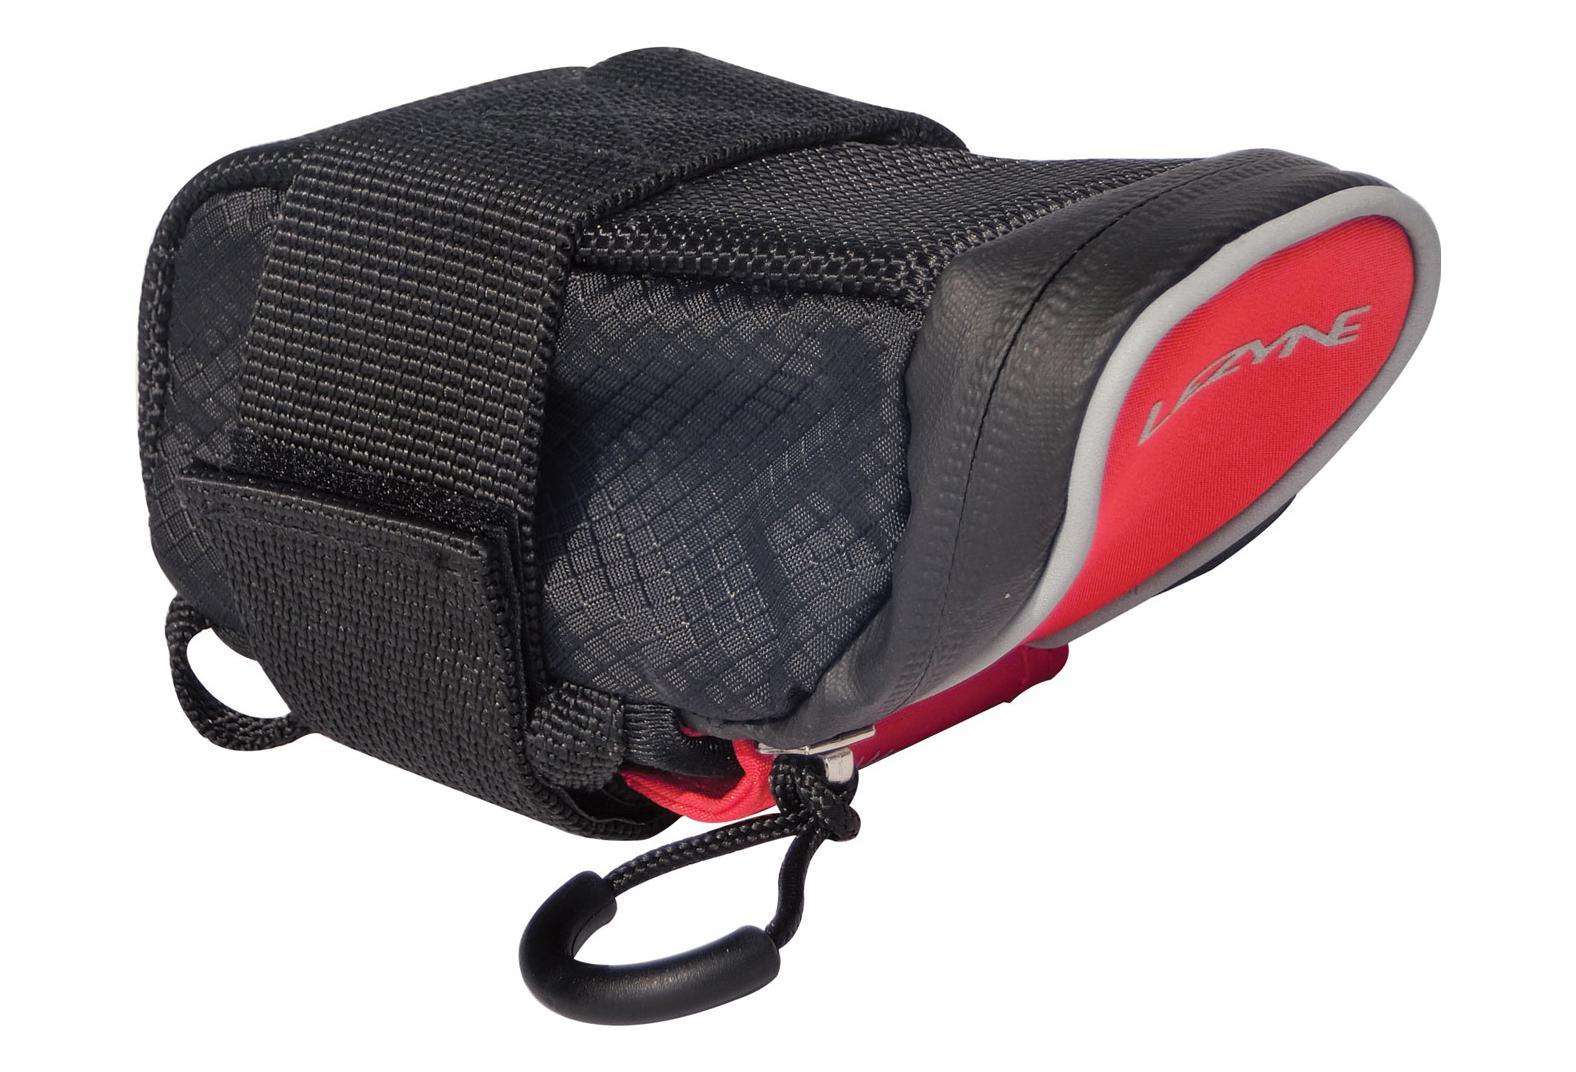 RED//BLACK Lezyne M-CADDY Bicycle Saddle Bag Road MTB Seat Bag Storage BLACK